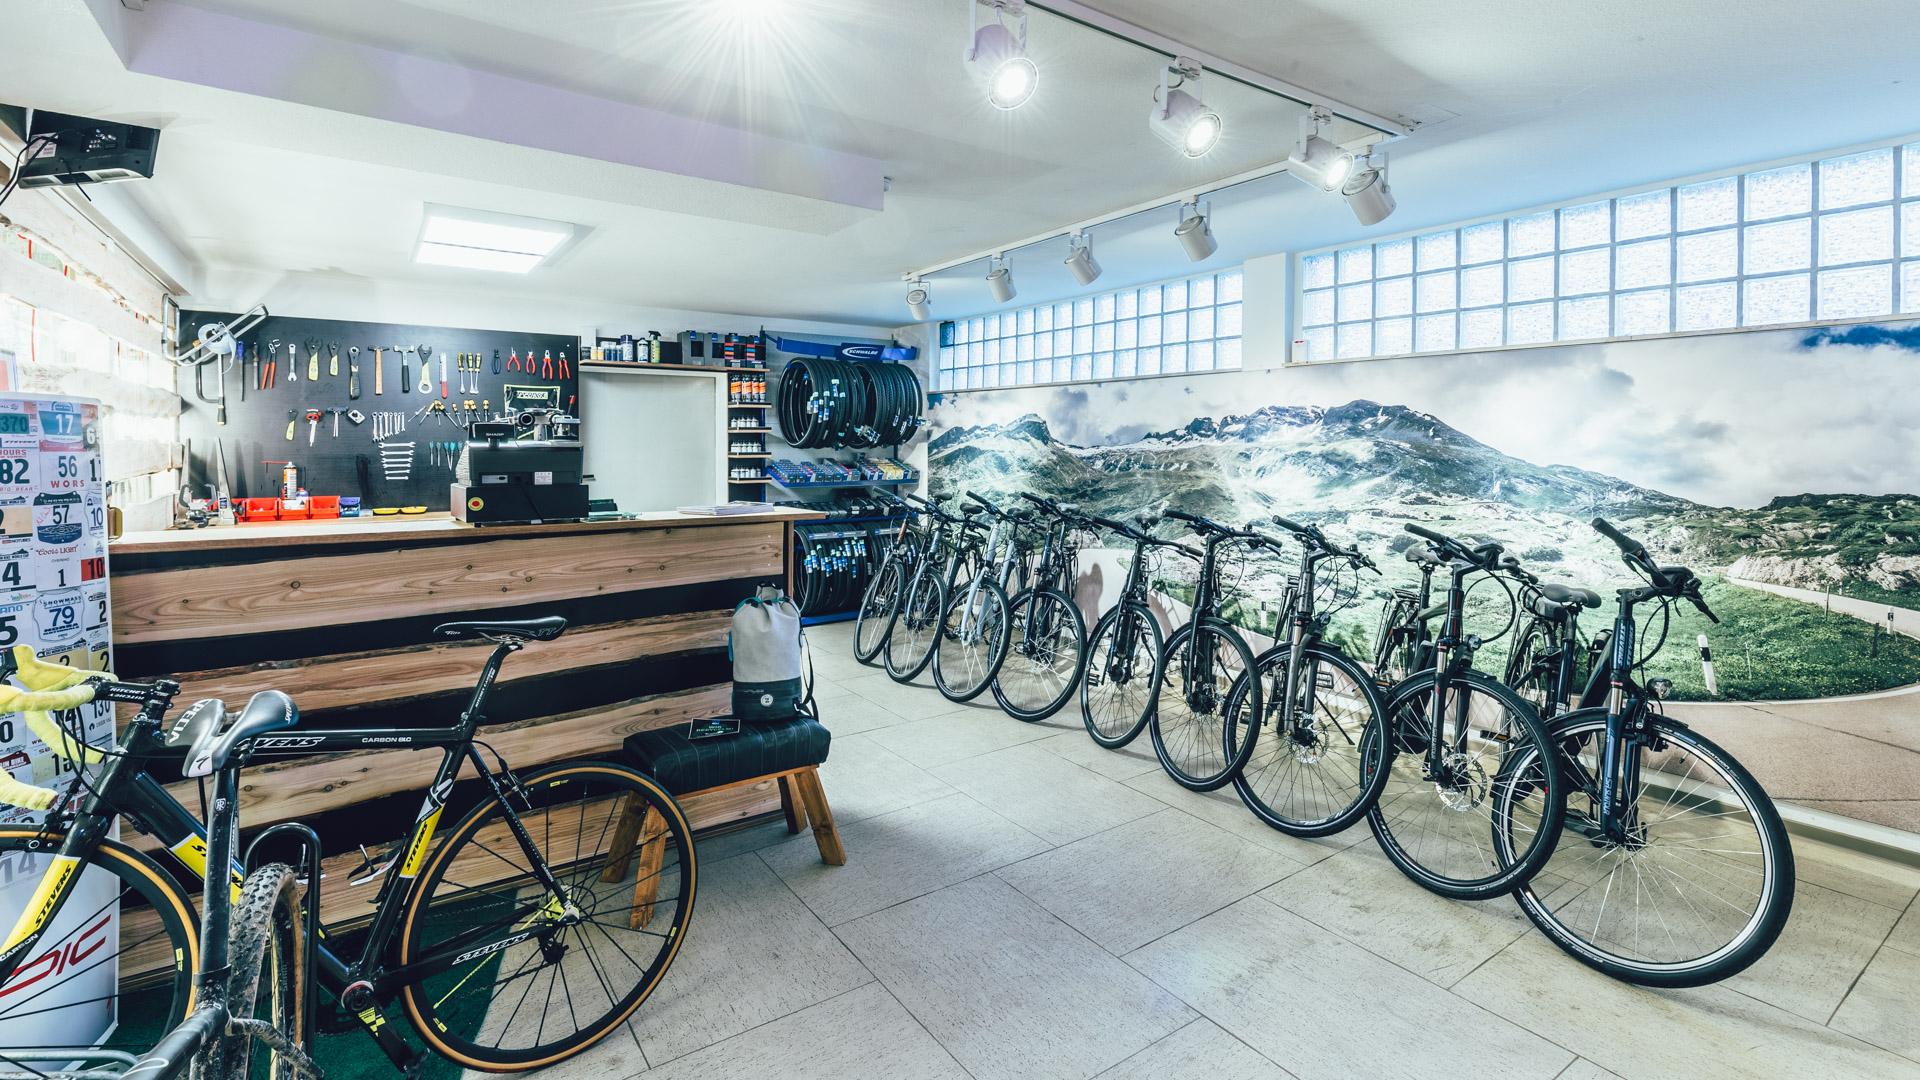 BIKE-FABRIK Fahrradwerkstatt I